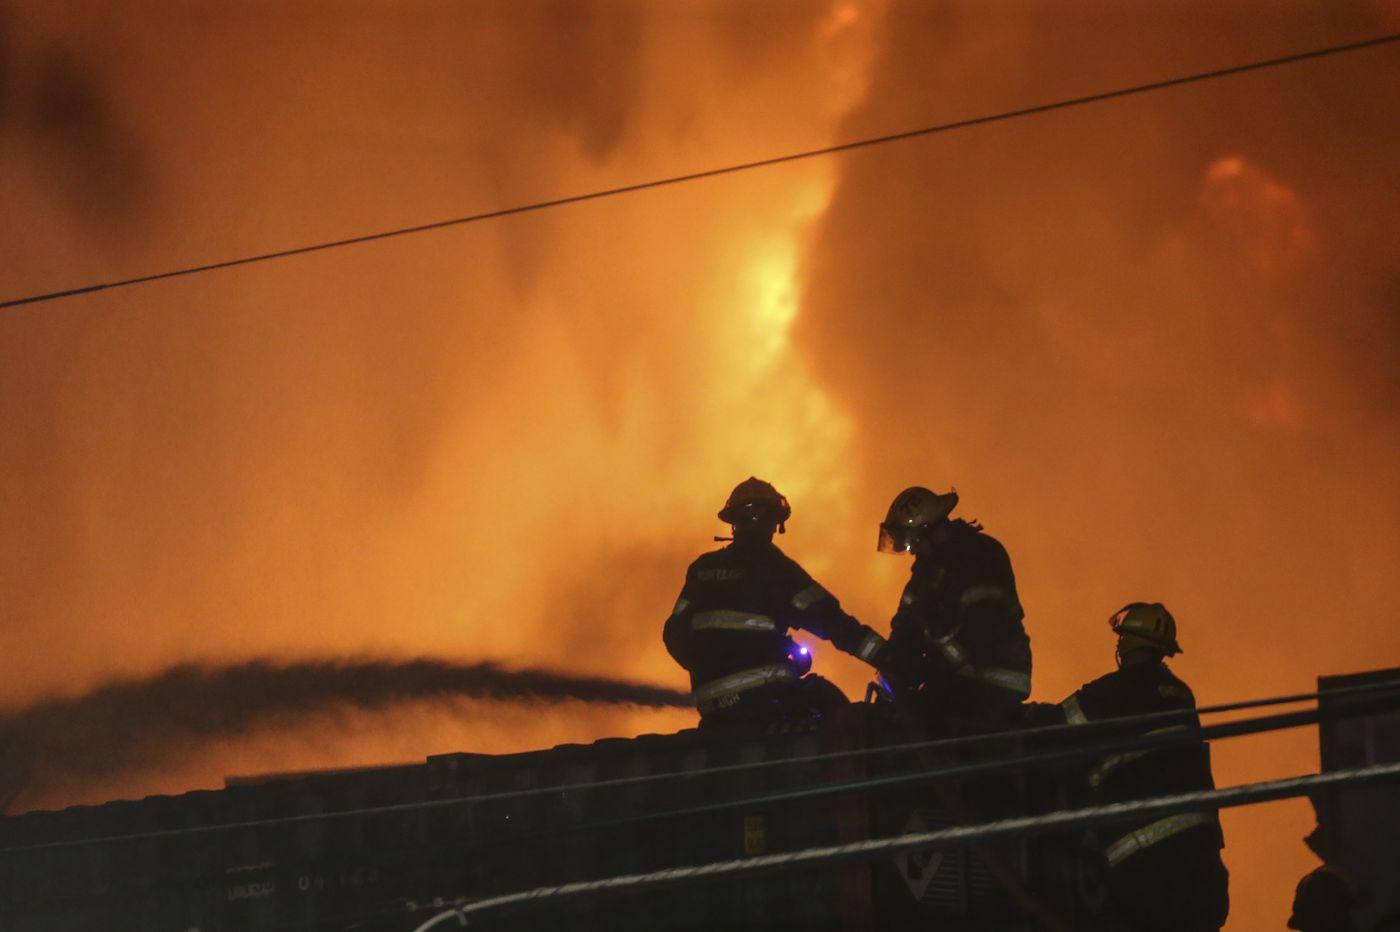 Kensington junkyard reopens, again, after major fire